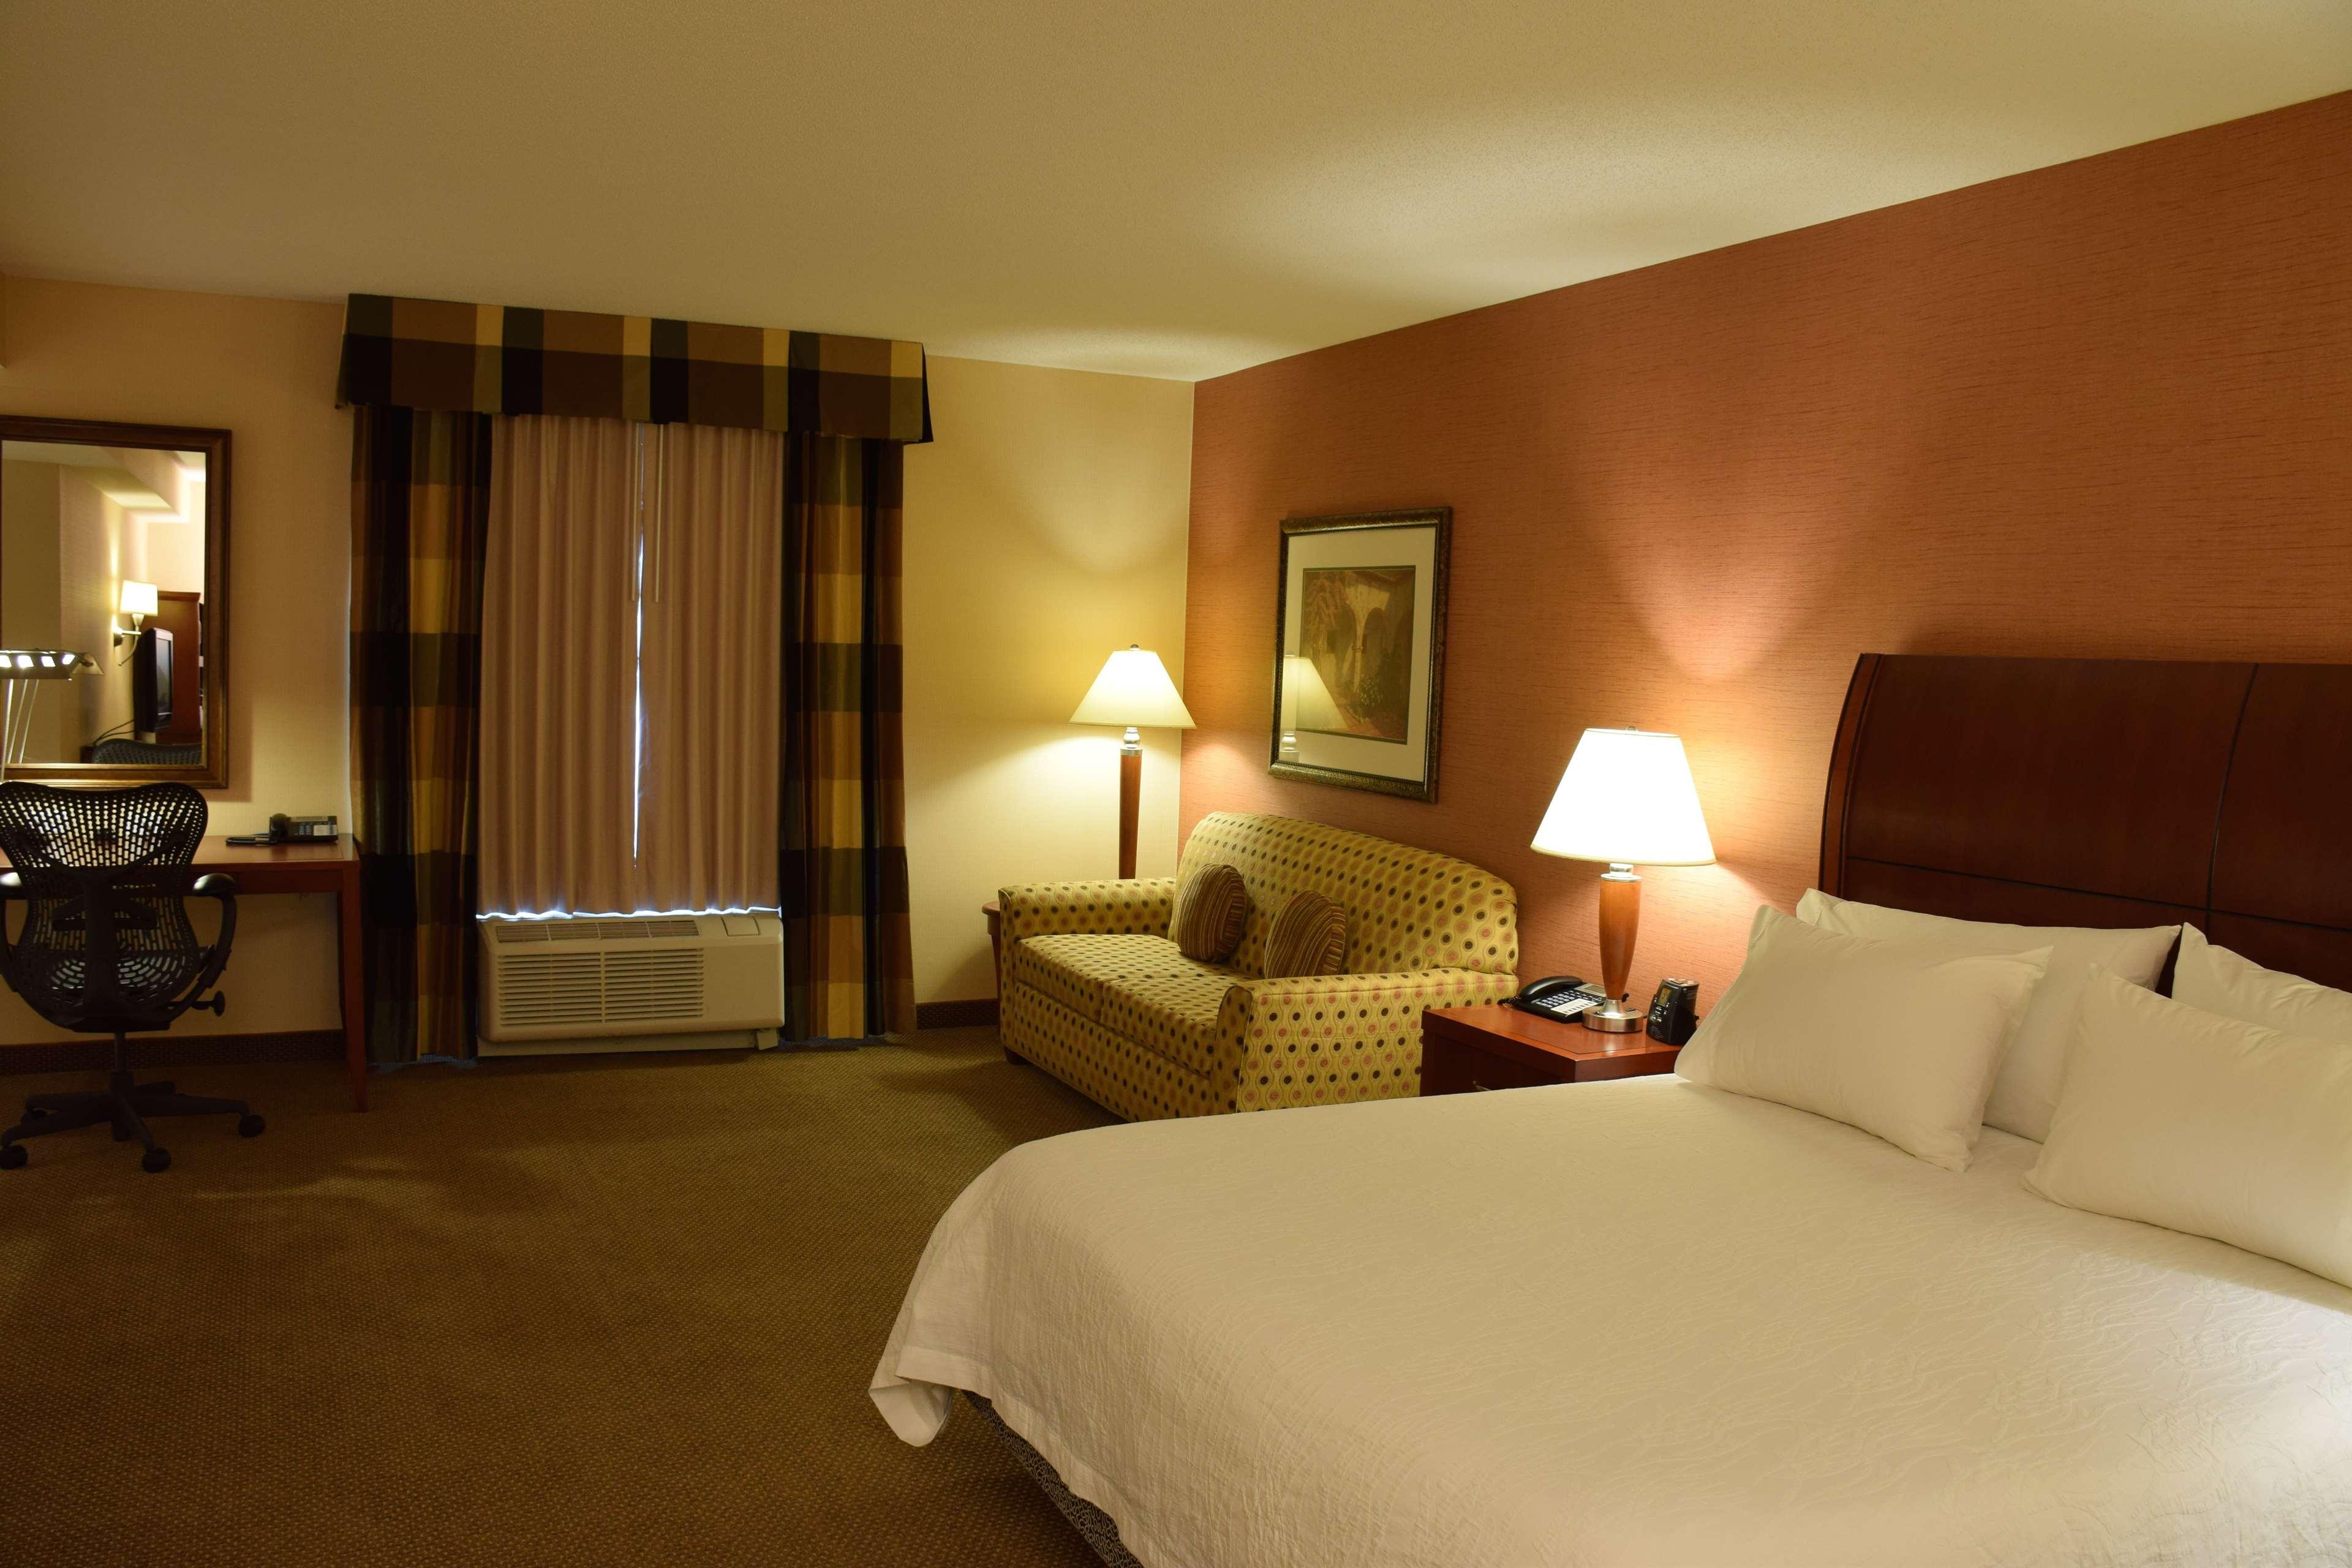 Hilton Garden Inn Dayton Beavercreek image 29